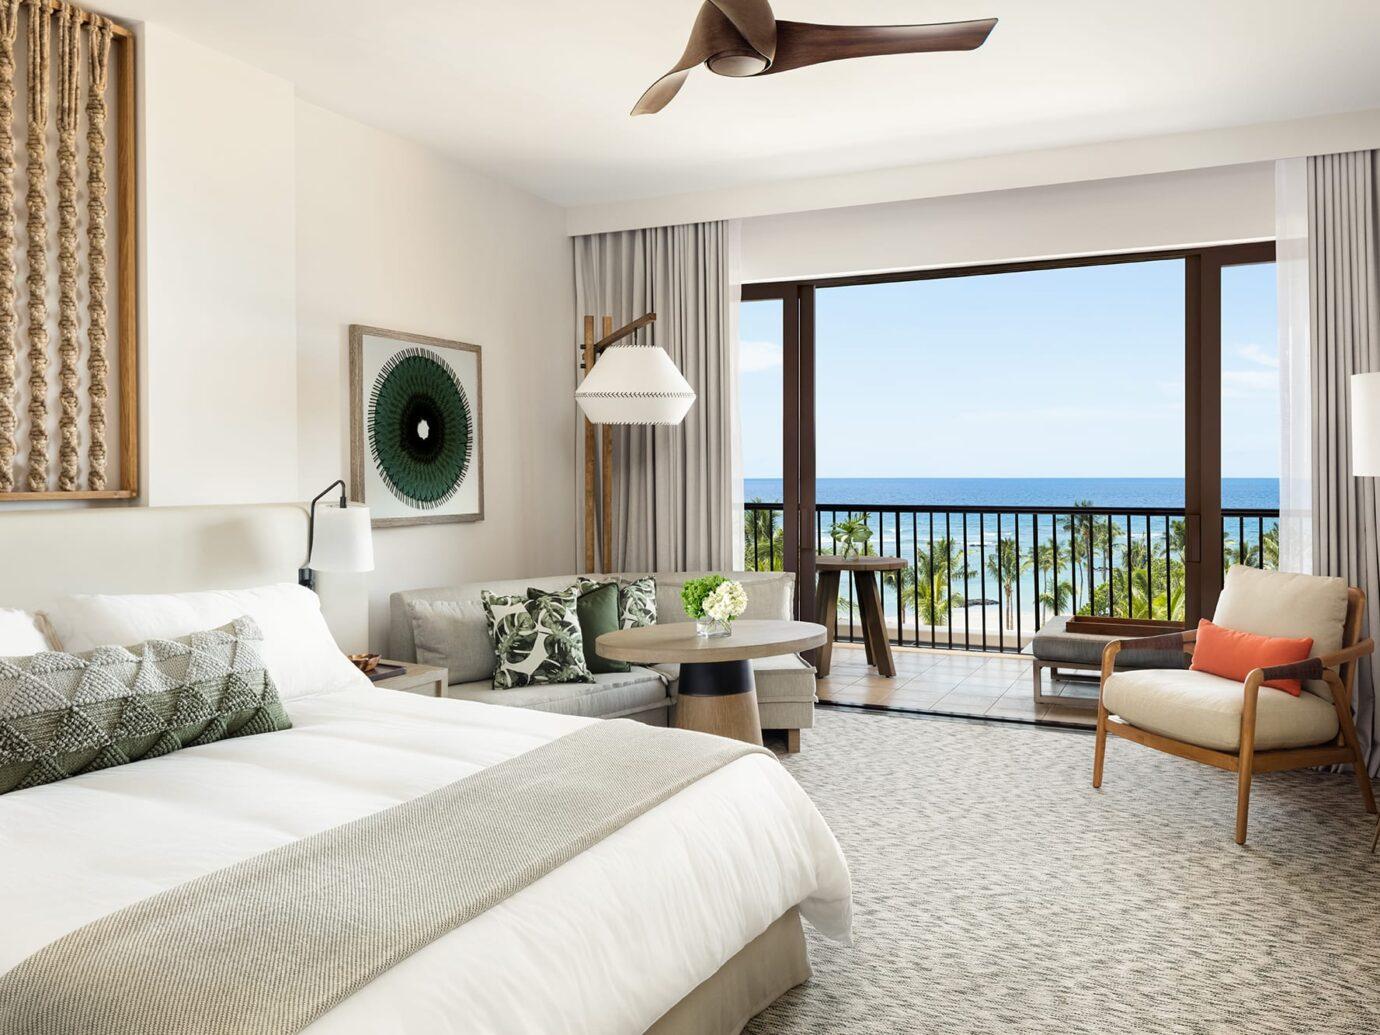 Bedroom at Mauna Lani, Auberge Resorts Collection